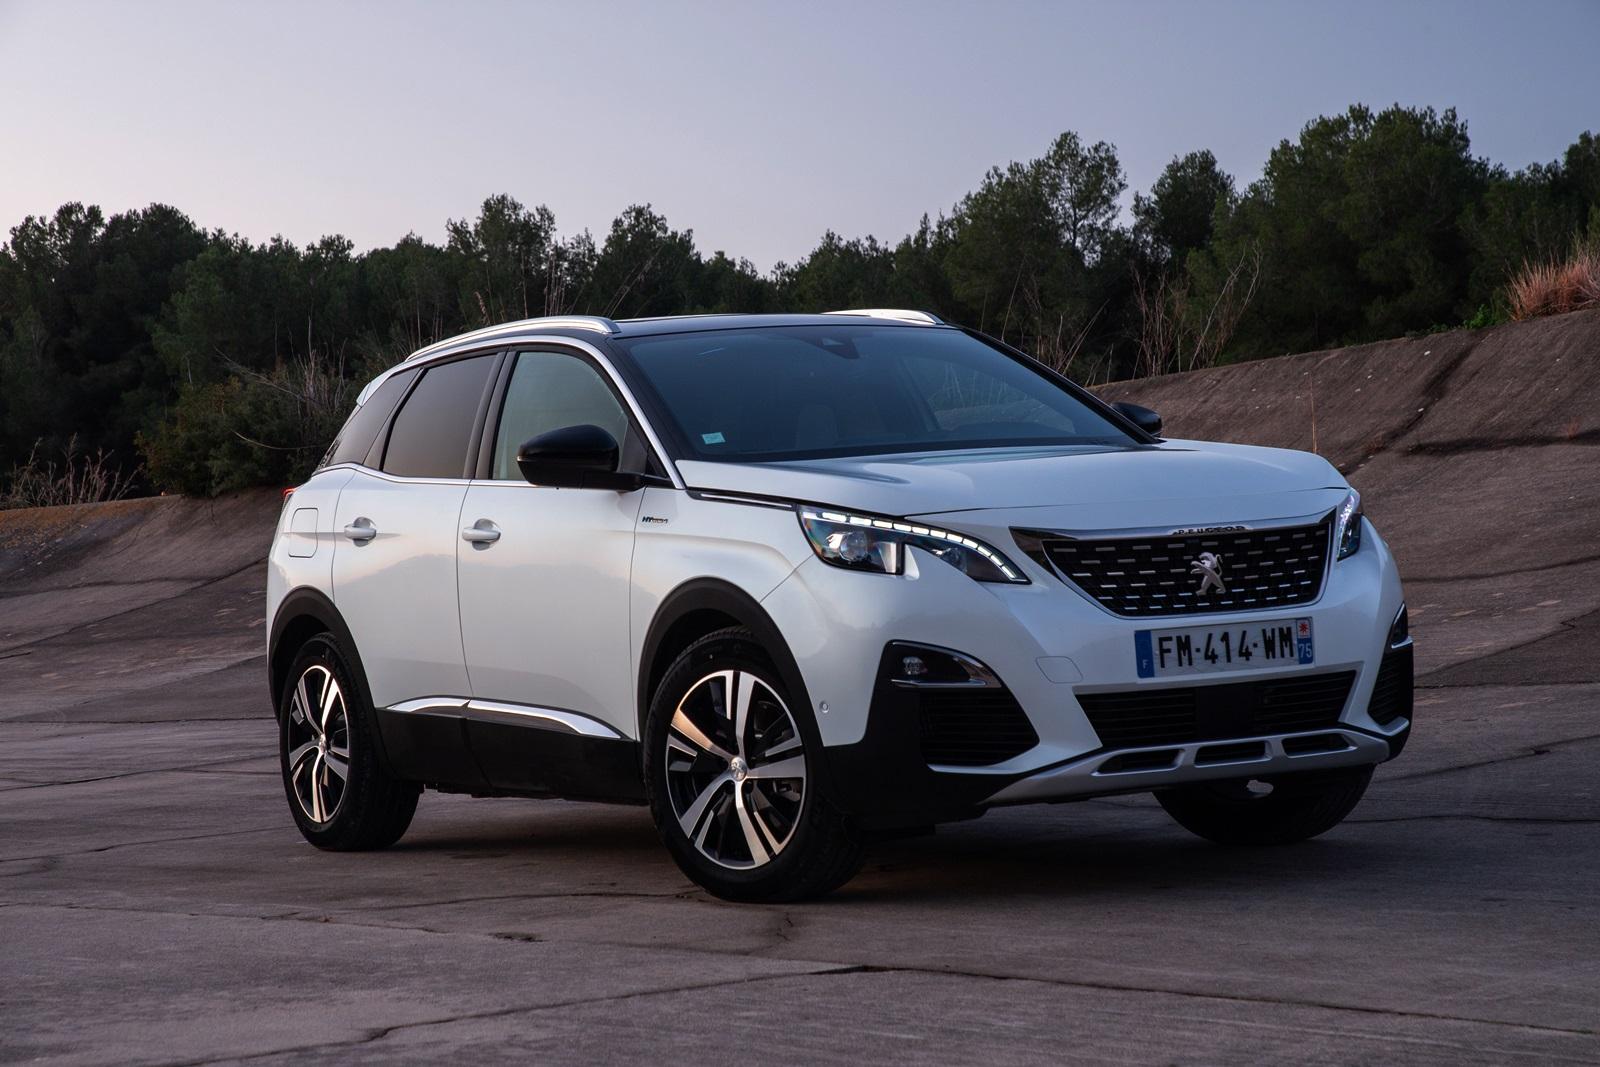 Peugeot Gama Electrificada (6)